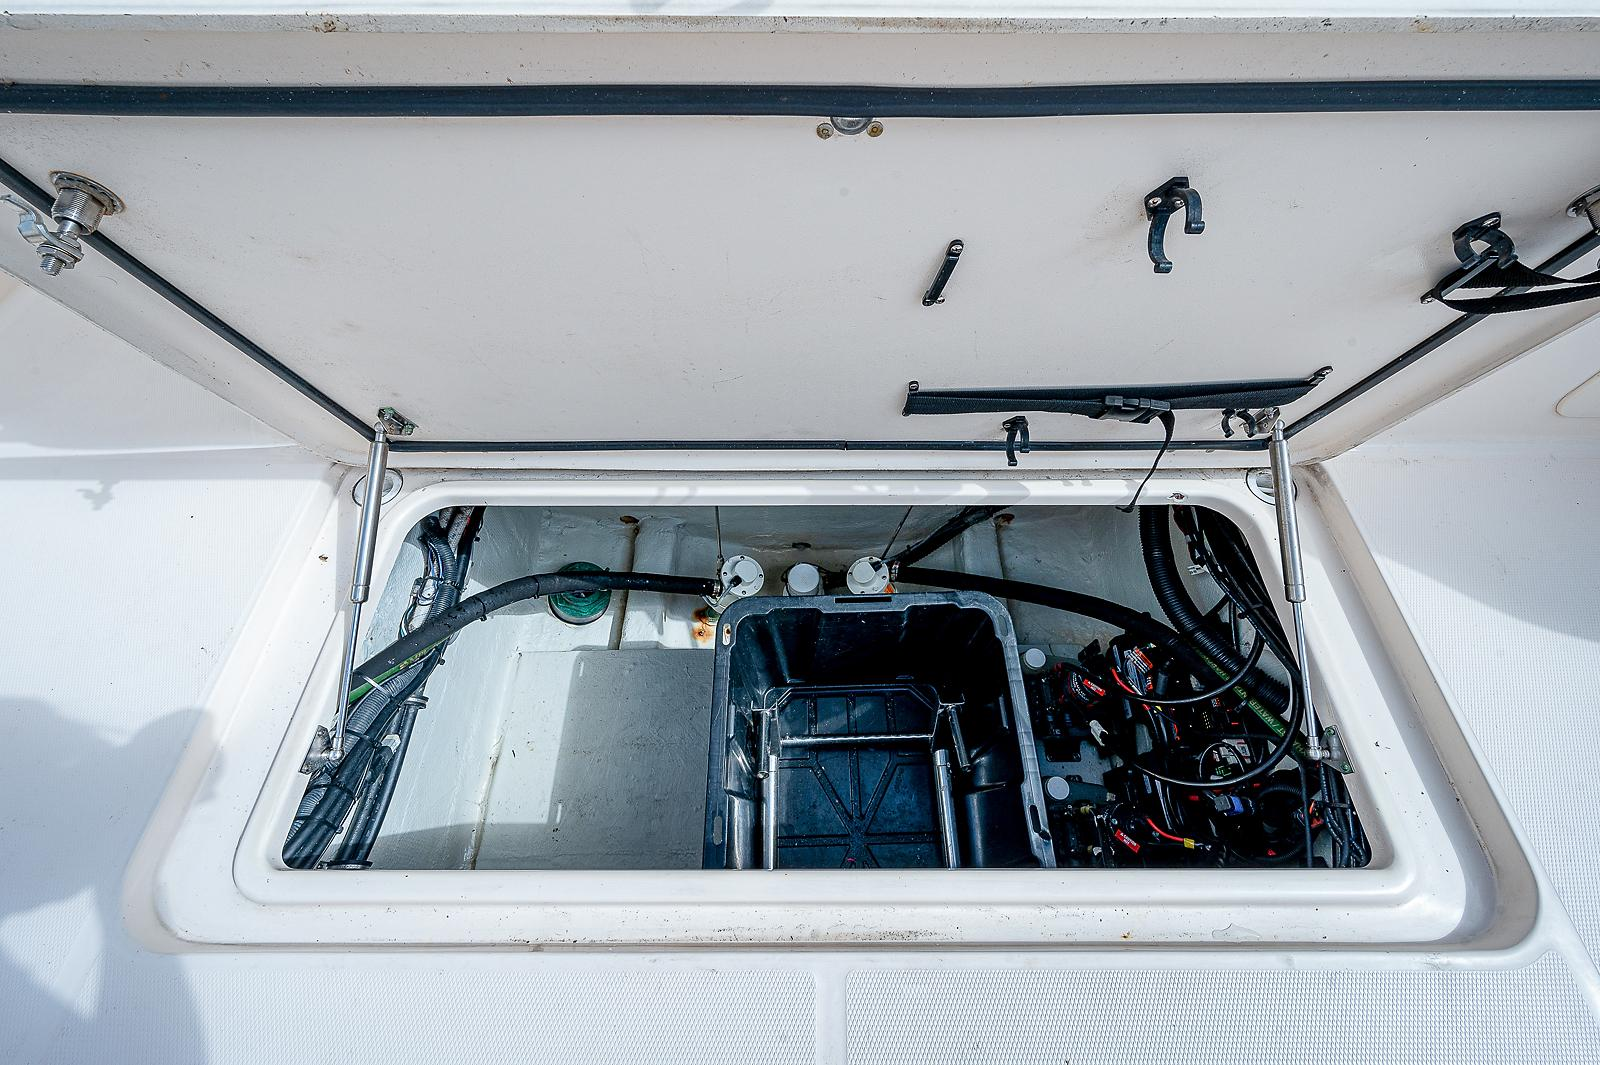 2019 Grady-White 336 Canyon Center Console